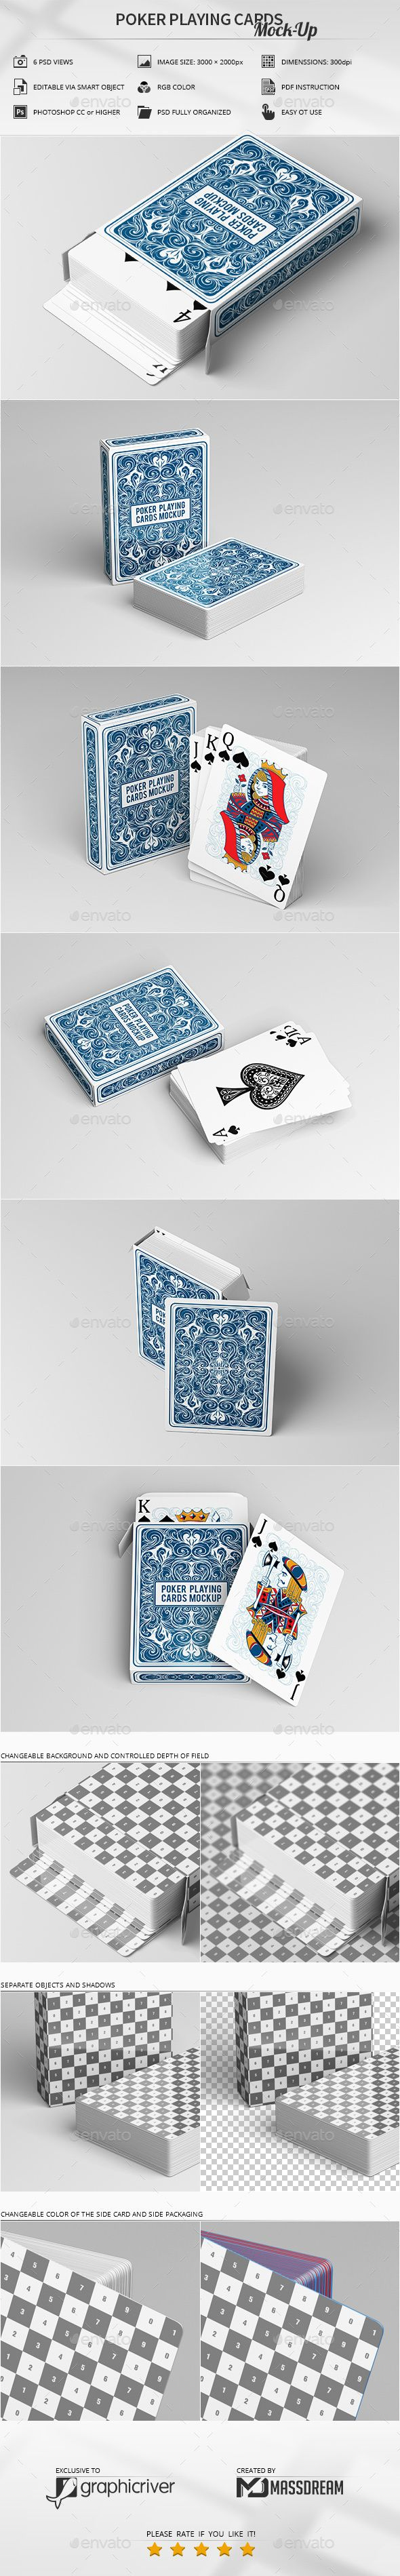 Poker Playing Cards MockUp. Professional shoe box mockup